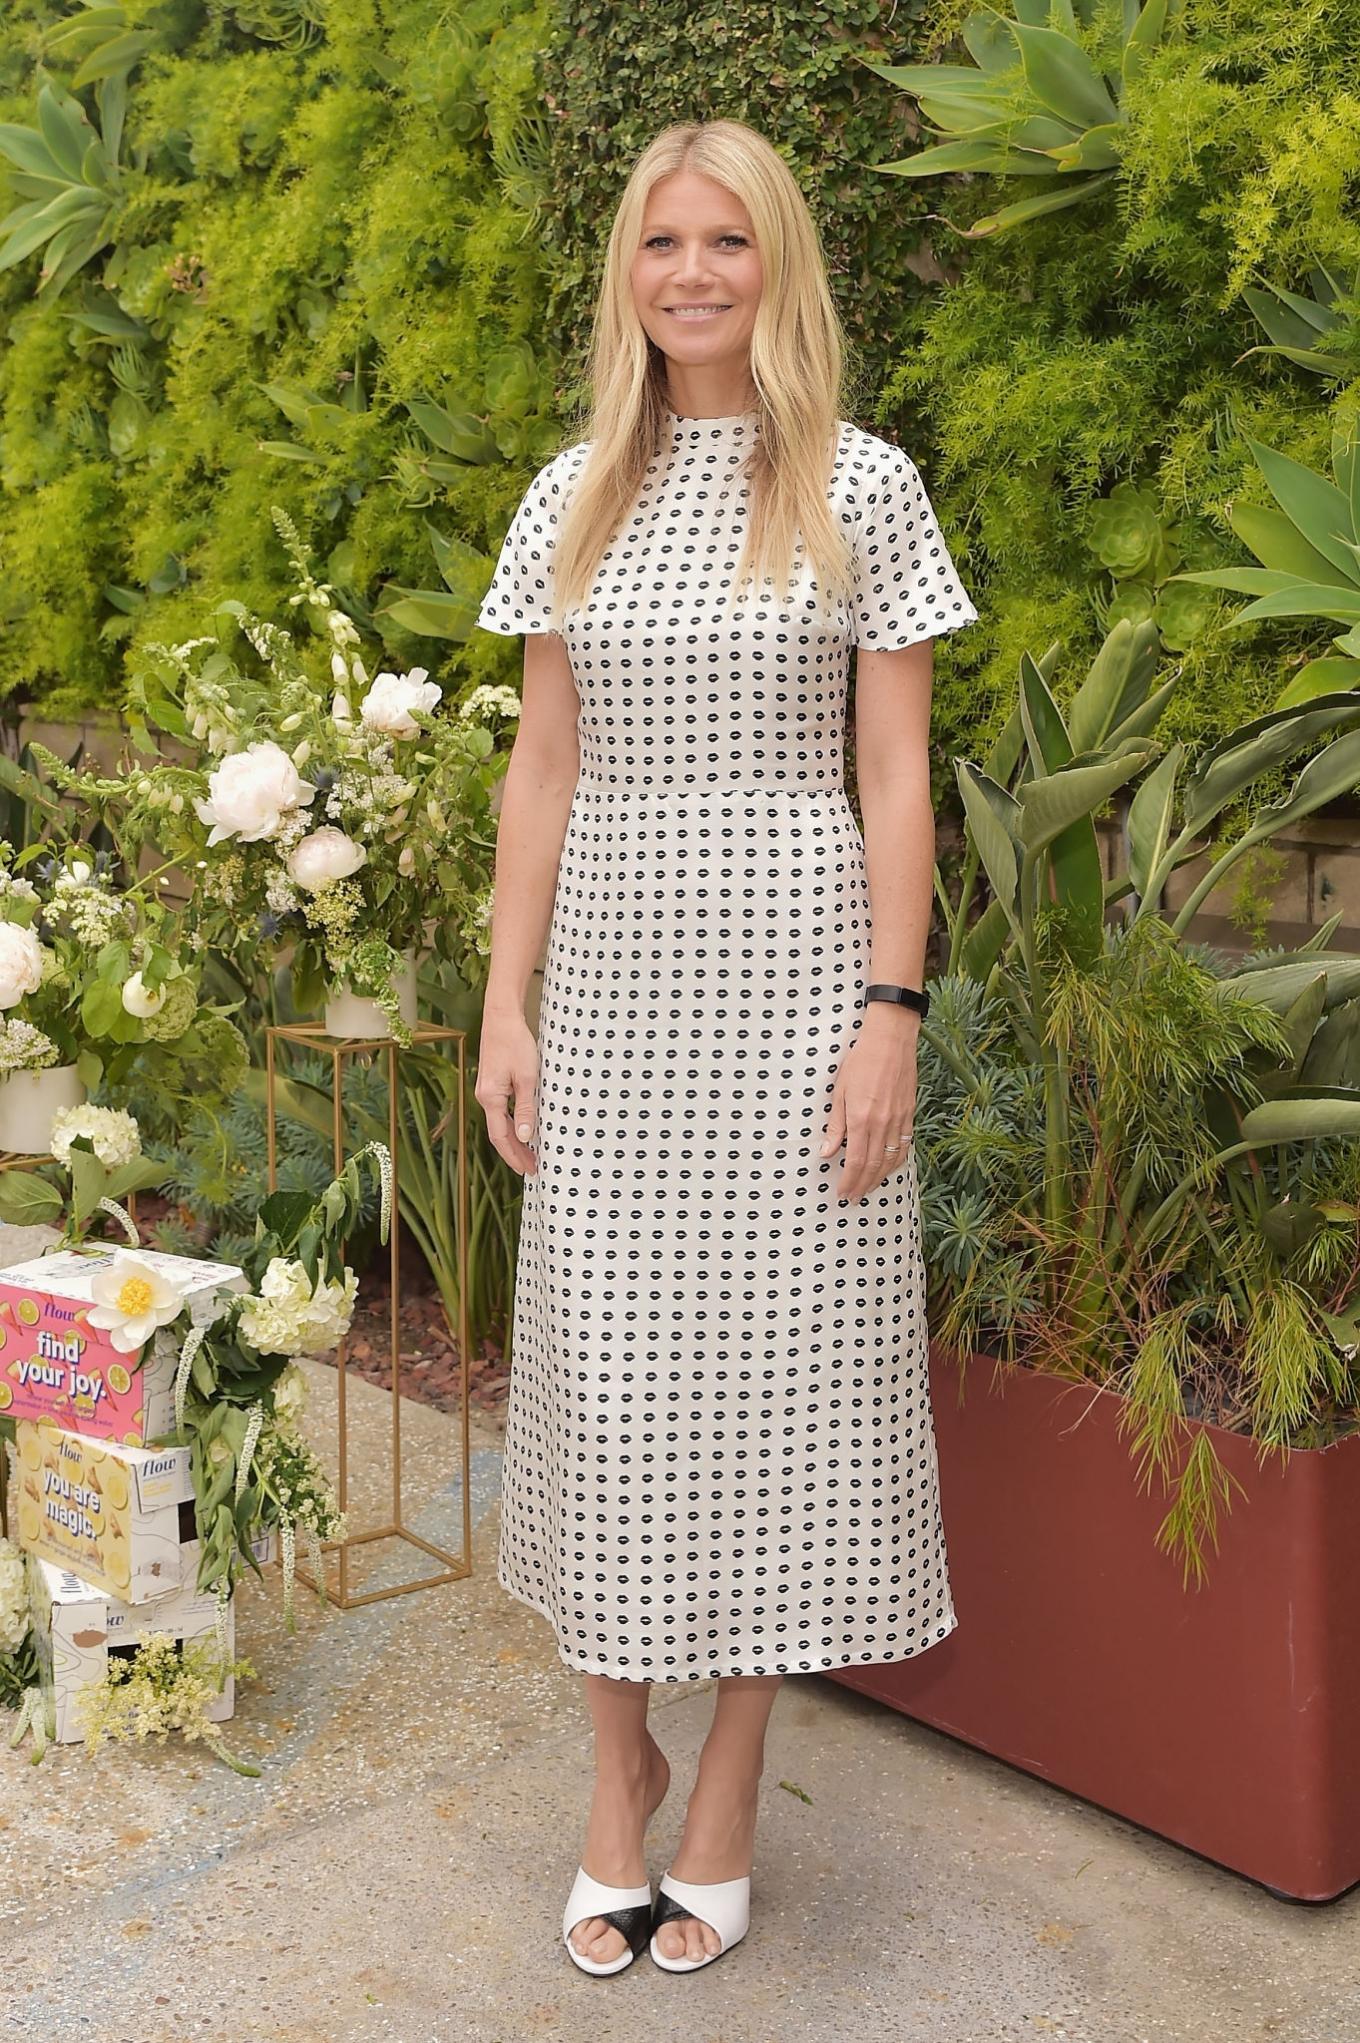 Gwyneth Paltrow - Goop Morning with Flow Alkaline Spring Water in California